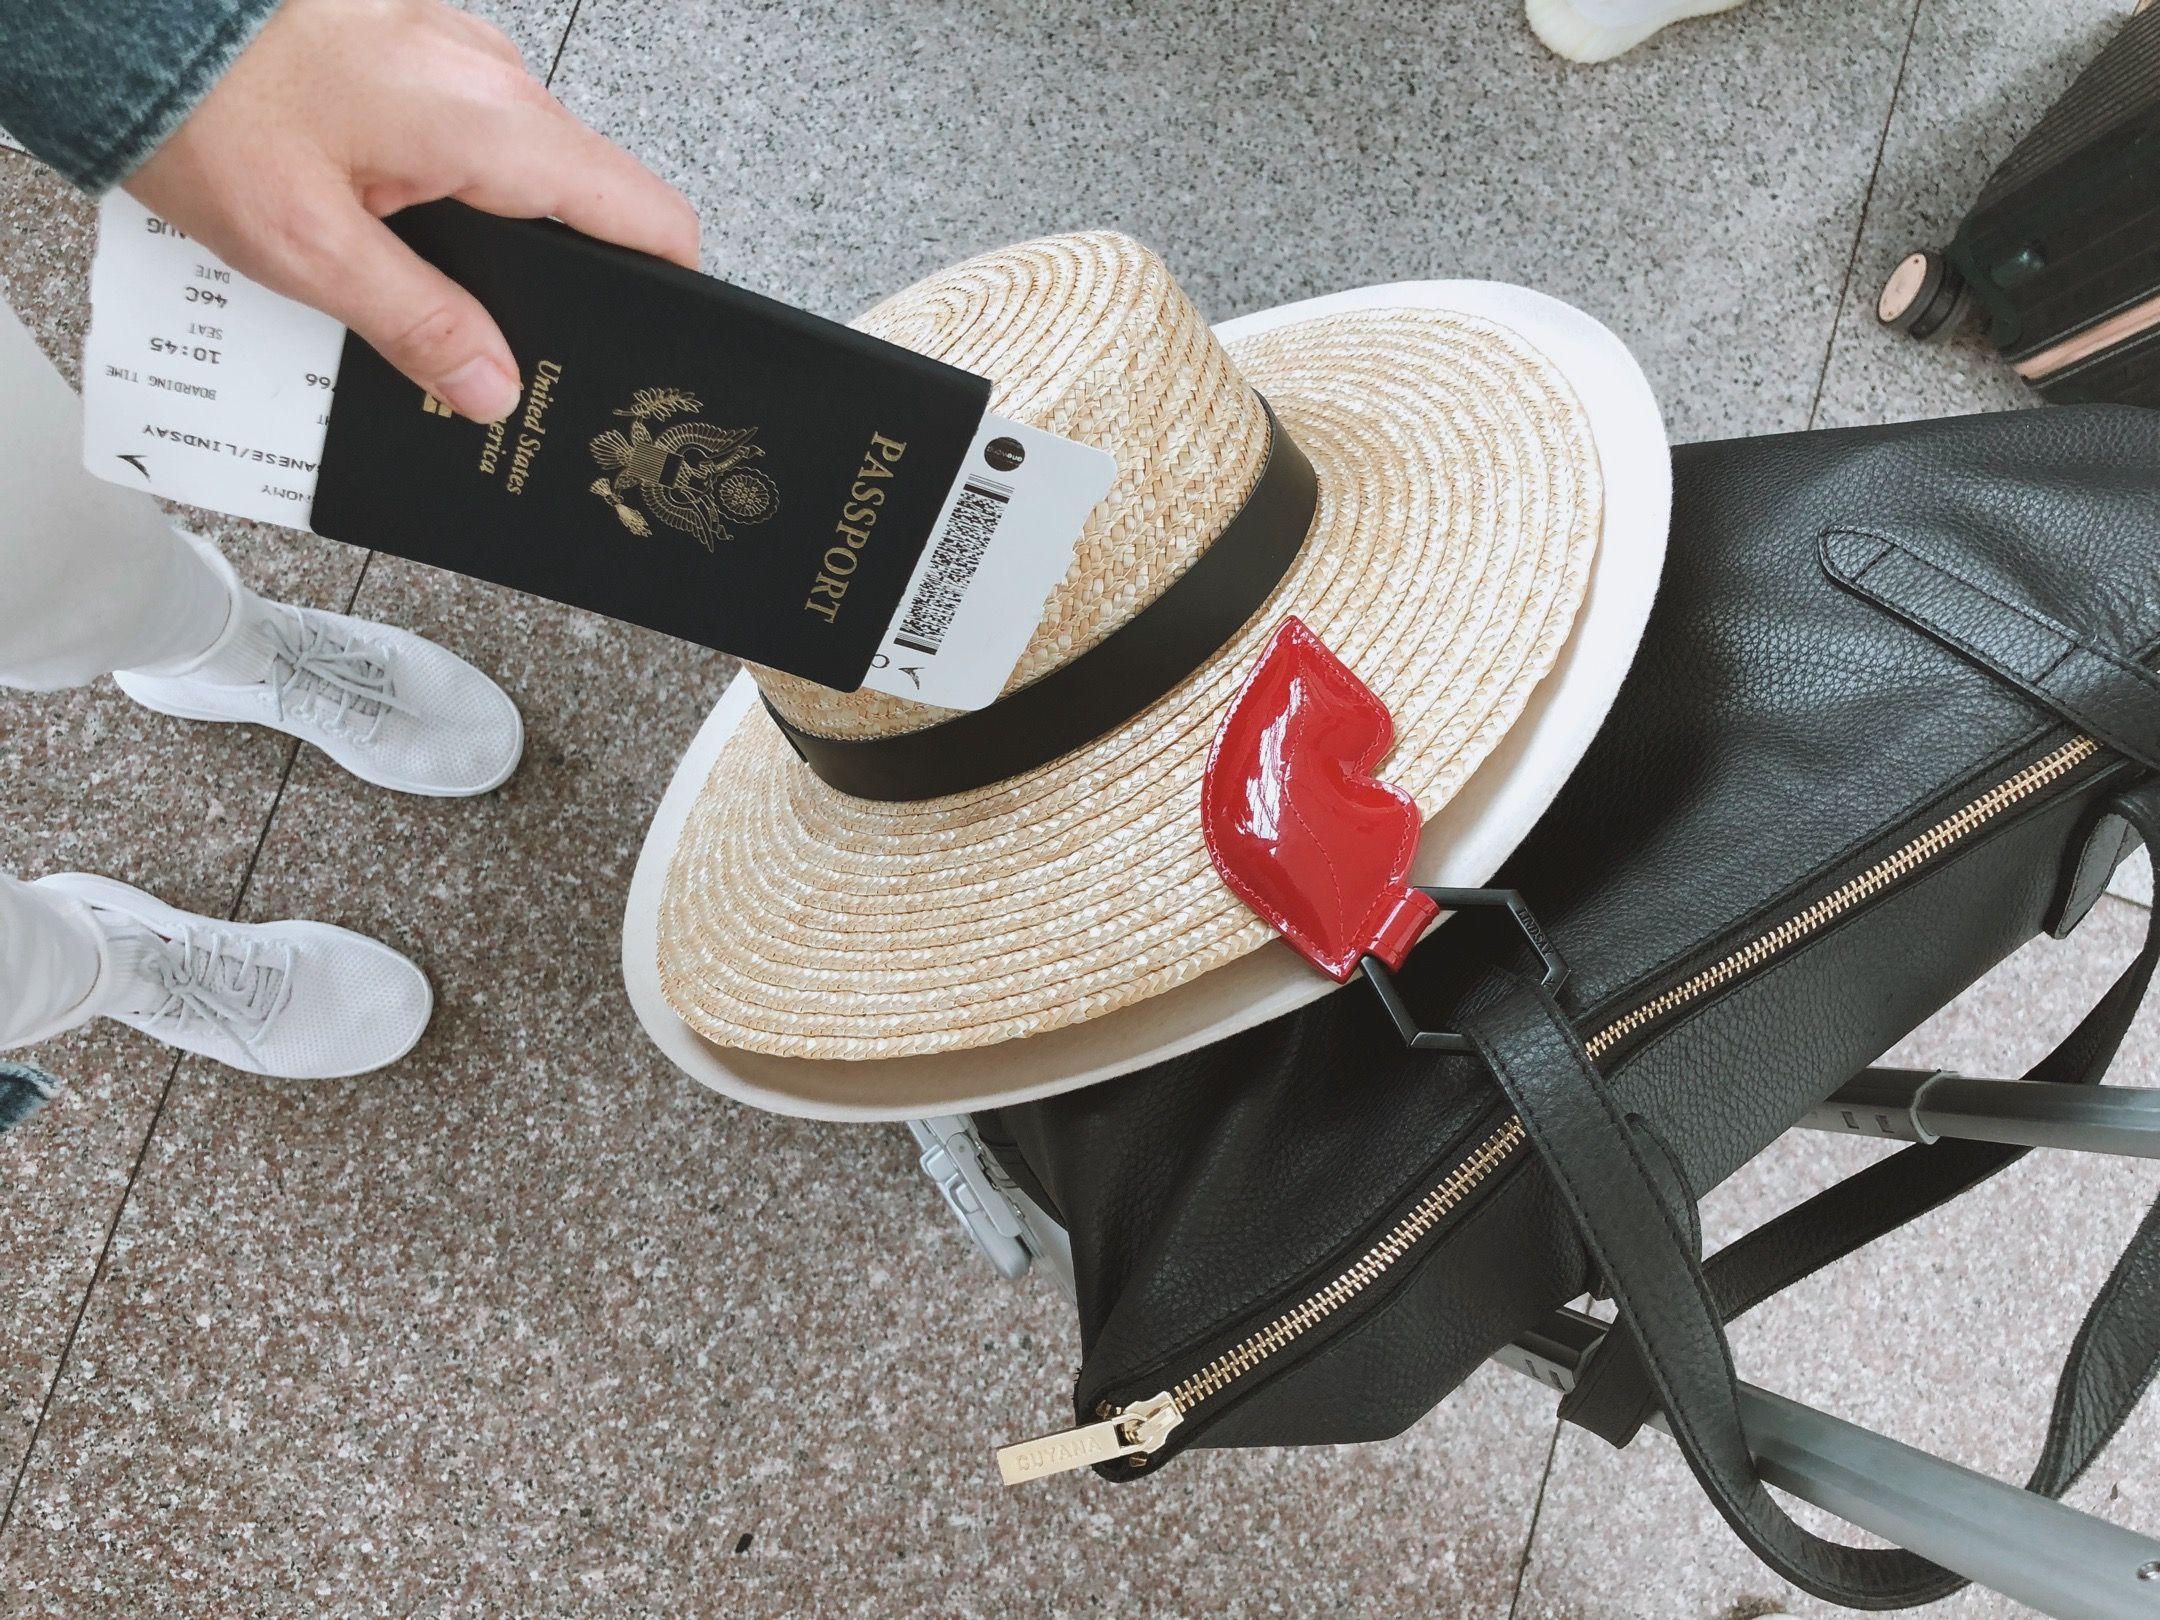 Pout Handbag Charms Cute Handbags Leather Protectant